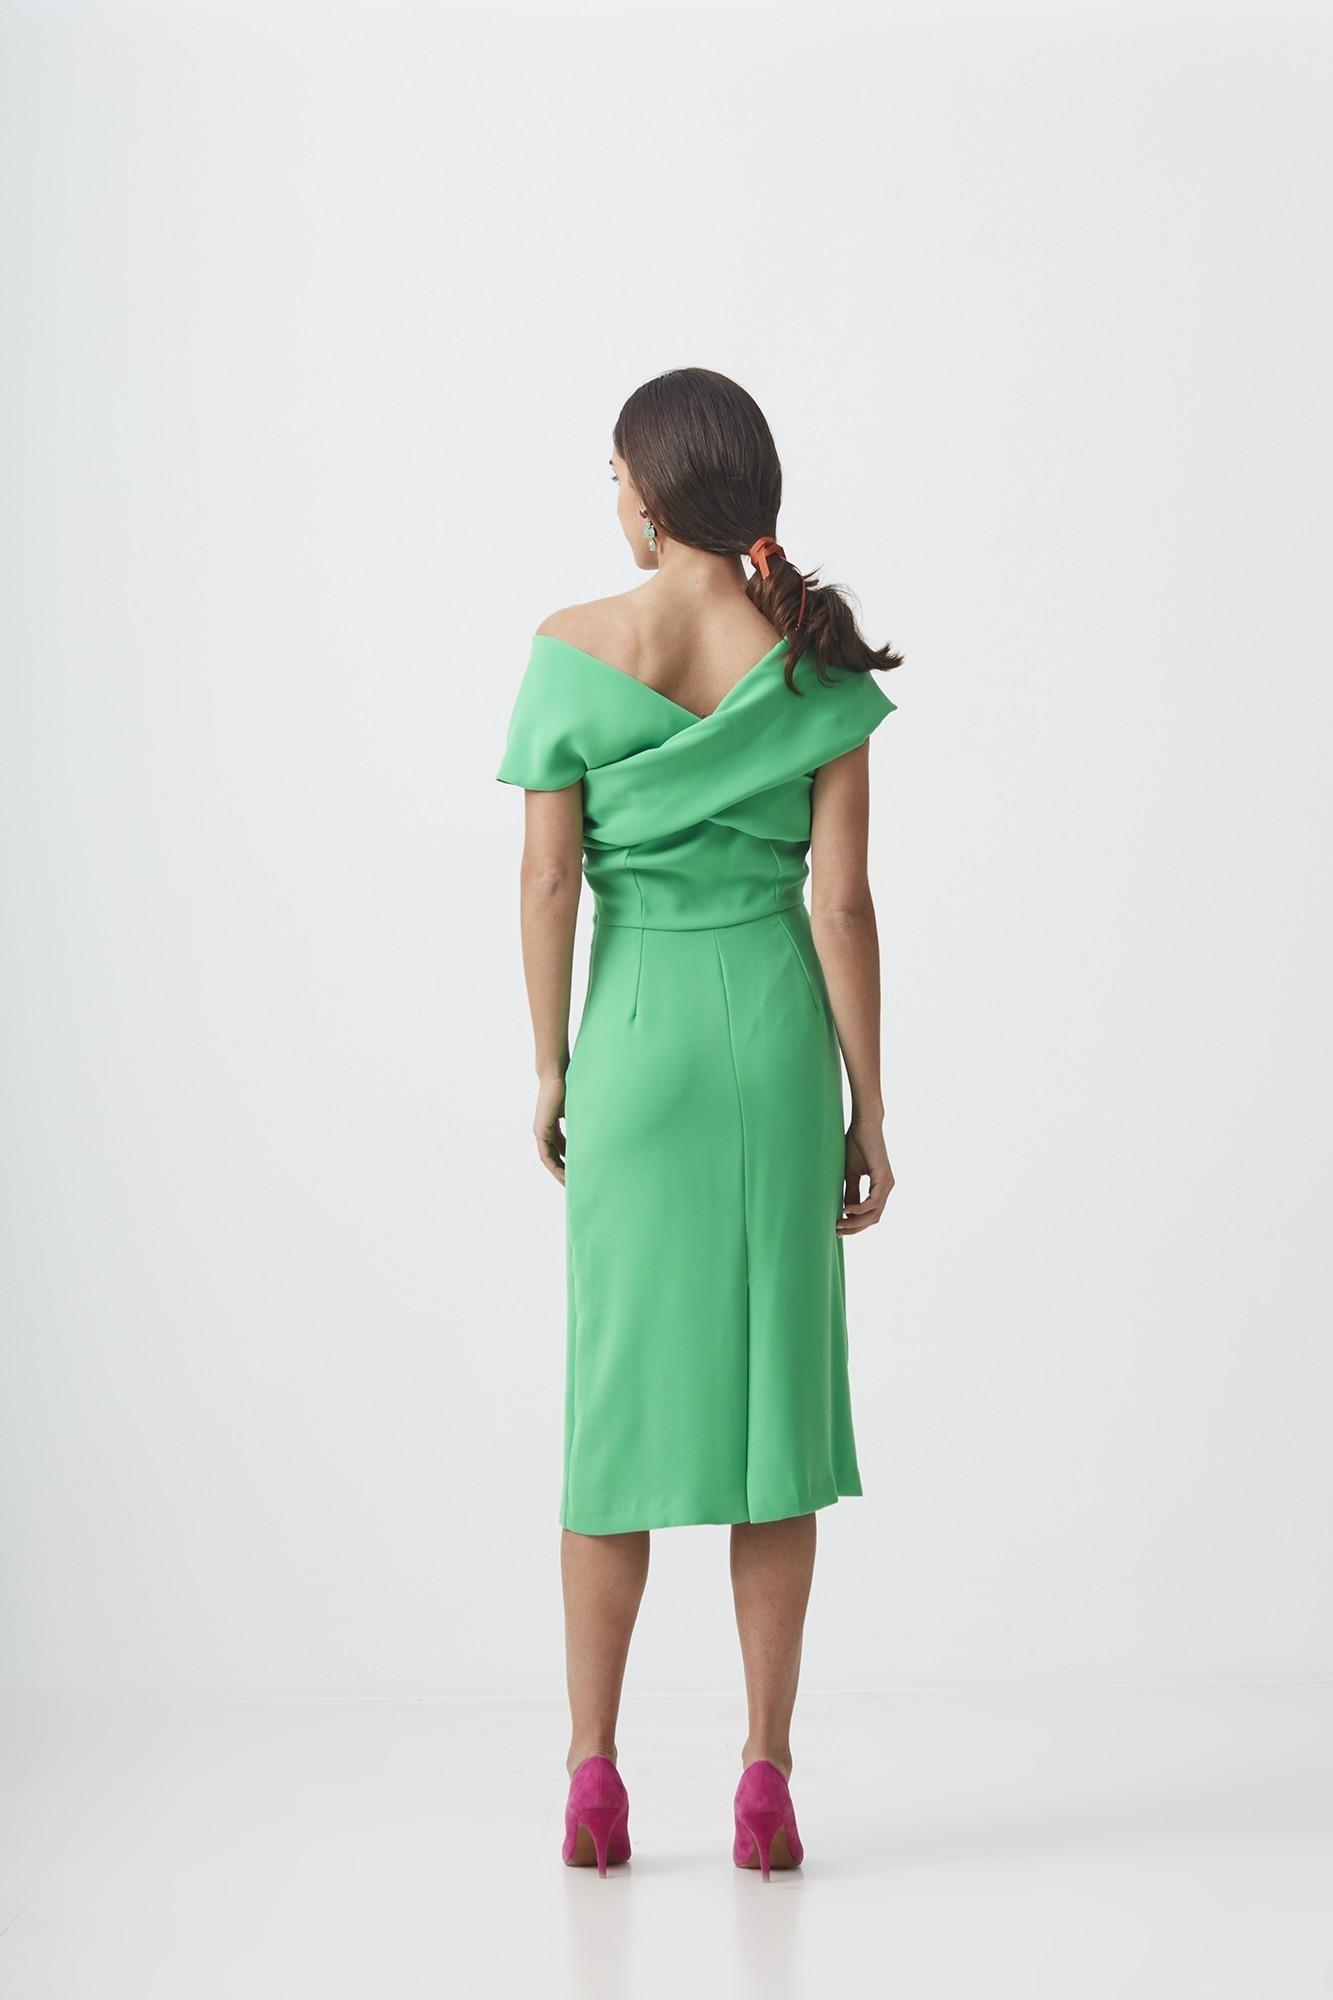 CURIE GREEN DRESS